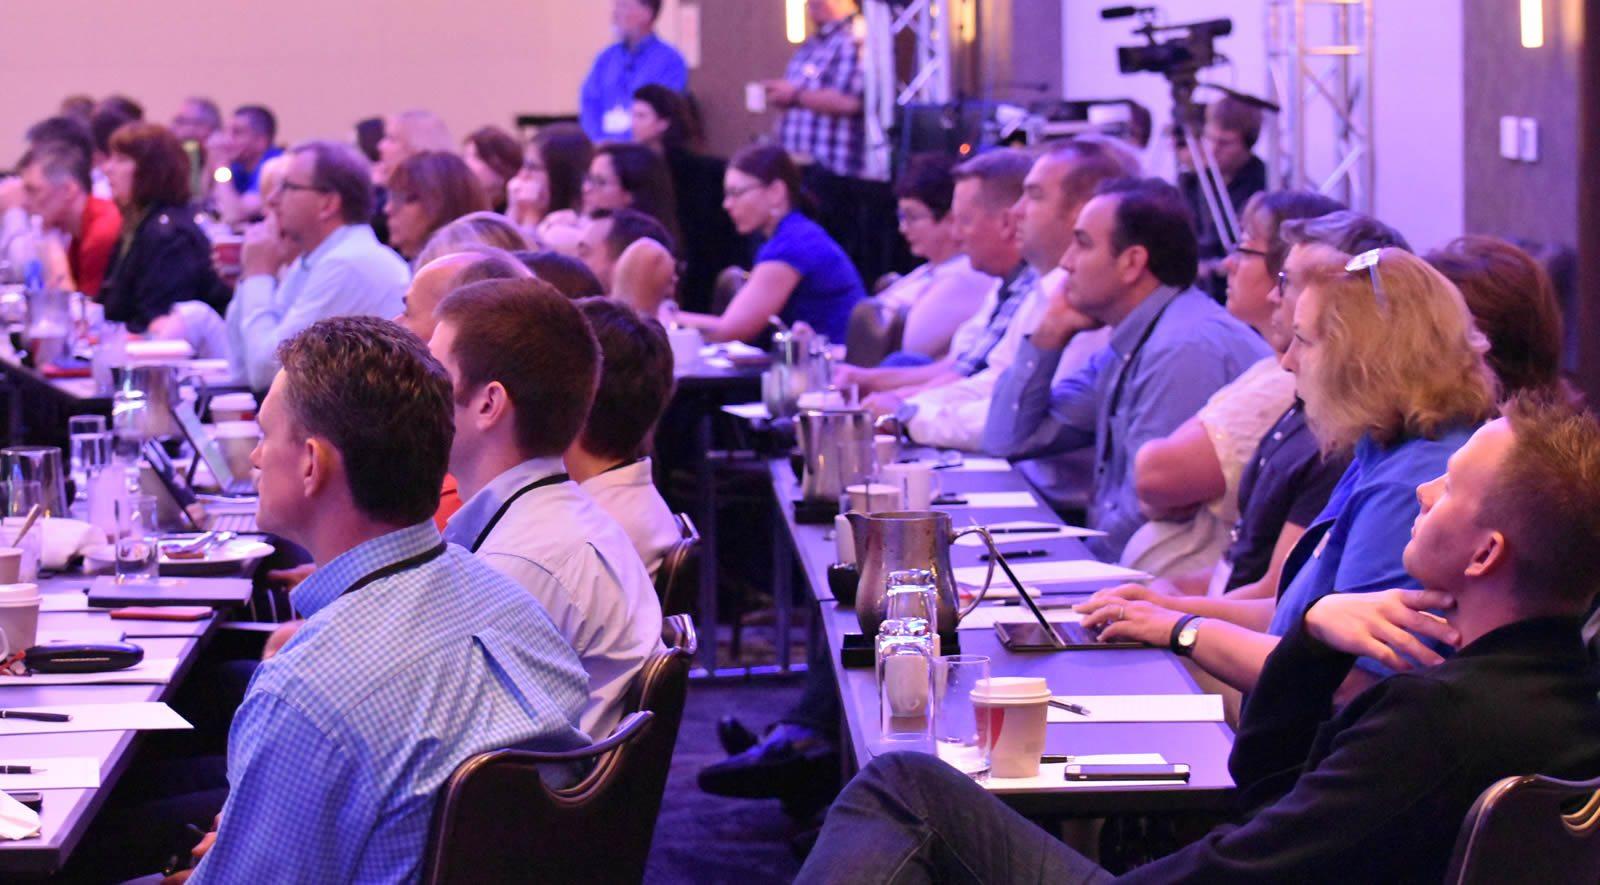 chicago-meetings-organization-content-management